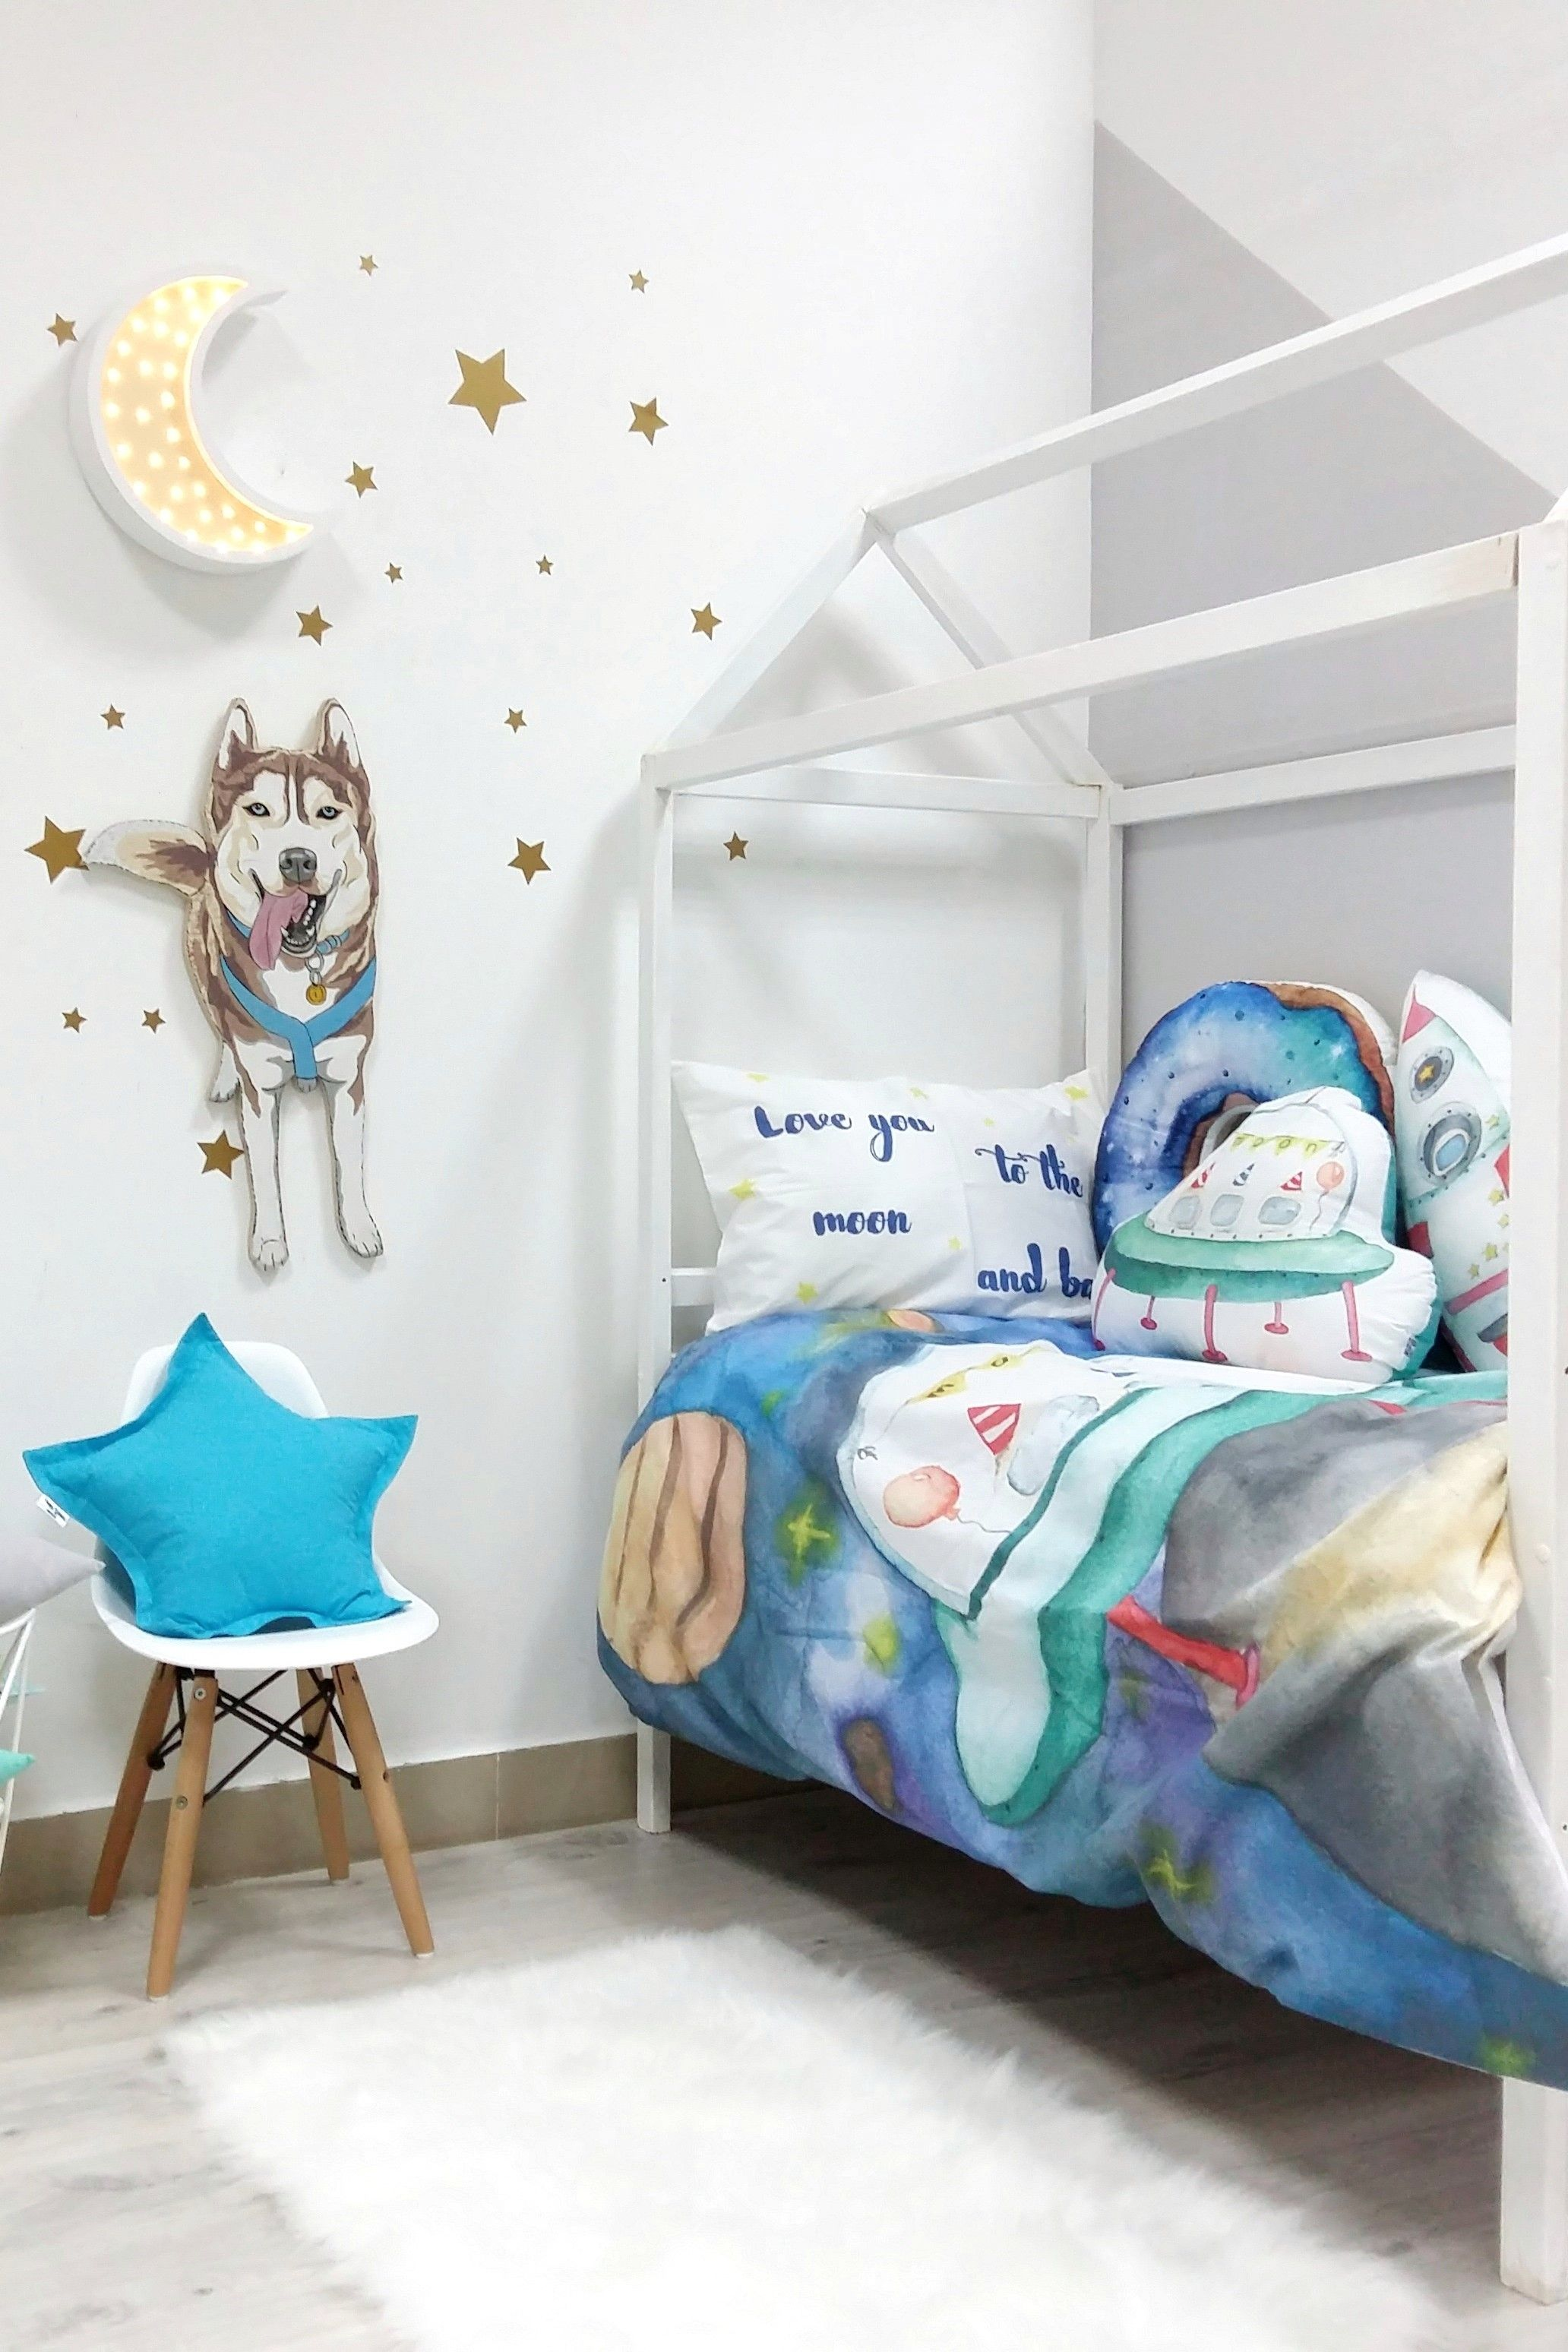 Spaces Bedding Set Space Bed Set Kids Bedroom Decor Kid Room Decor